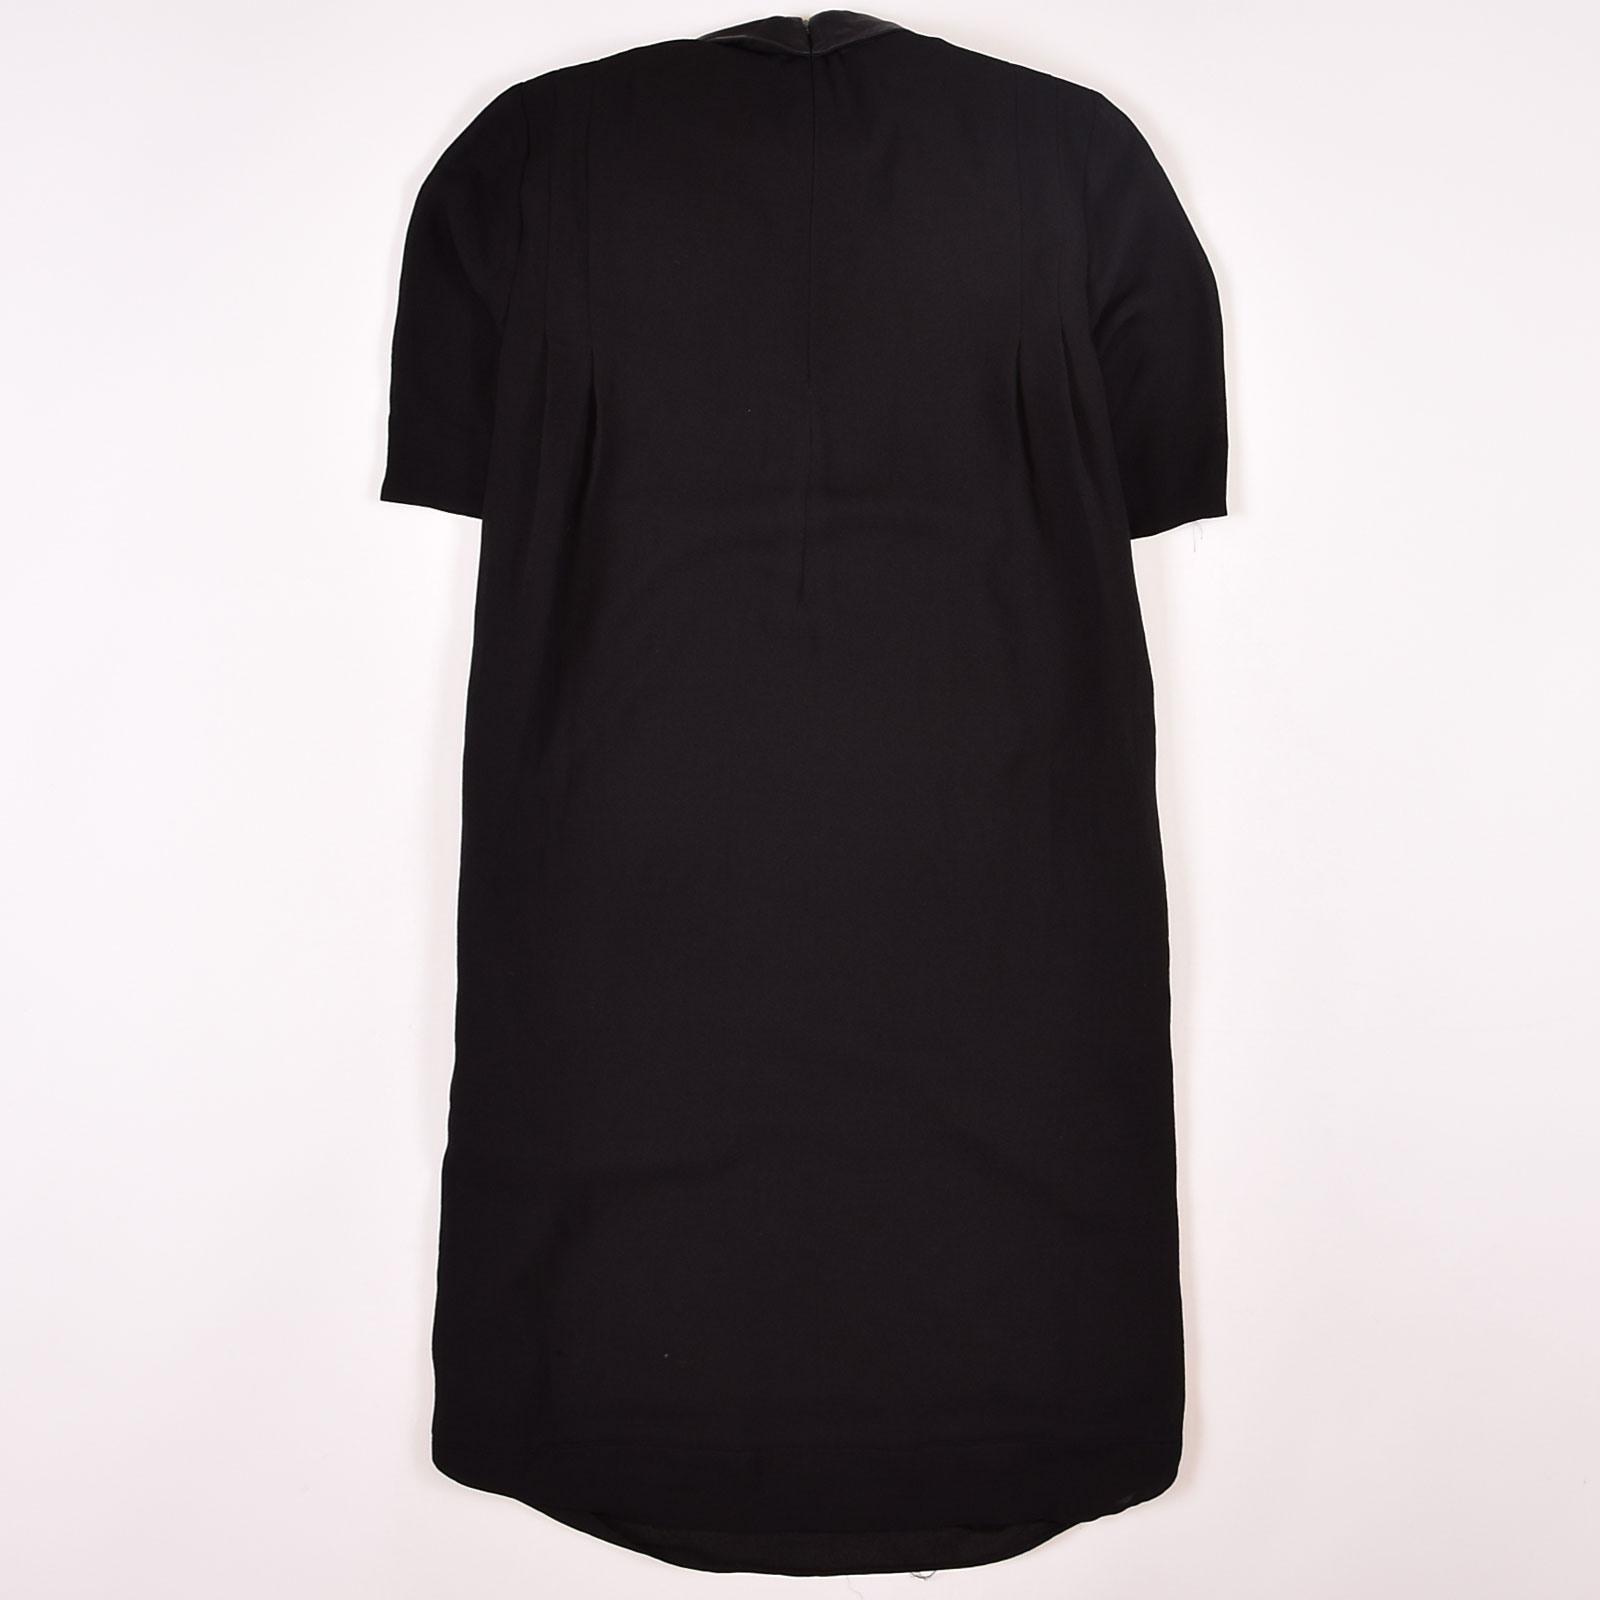 Cos Damen Kleid Dress Casual Freizeit Gr34 Damenmode